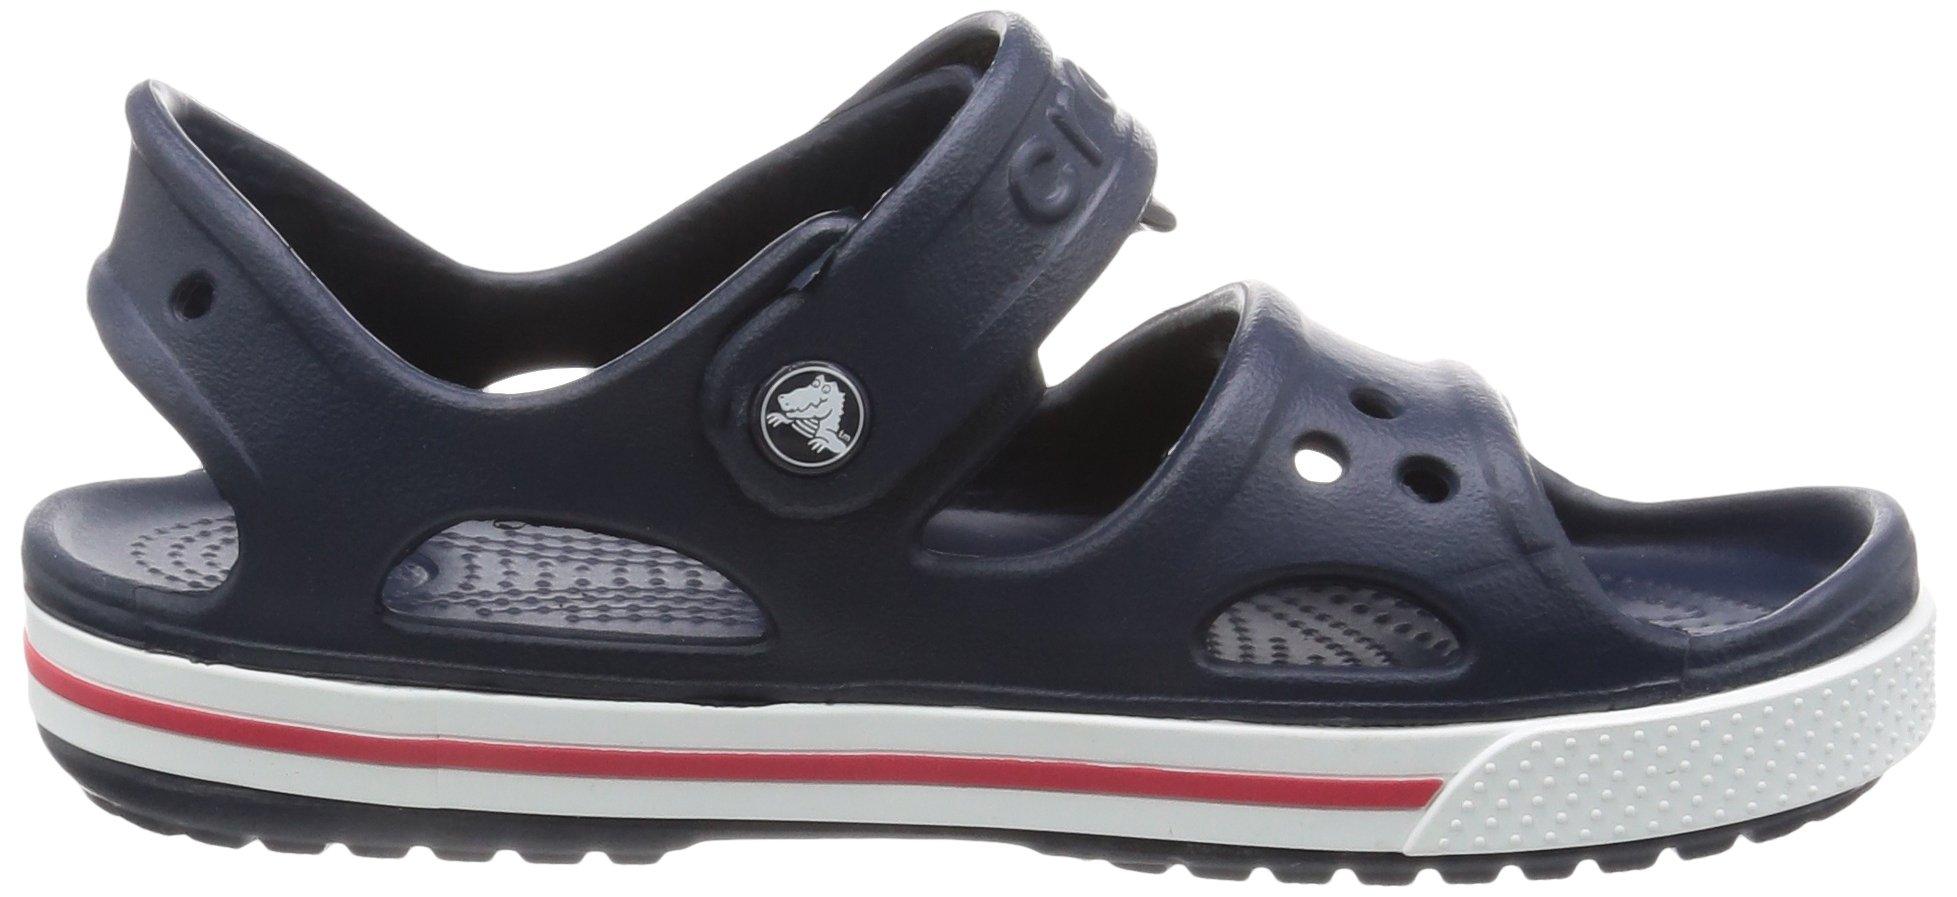 Crocs Kid's Boys and Girls Crocband II Sandal | Pre School, Navy/White, 5 M US Toddler by Crocs (Image #12)